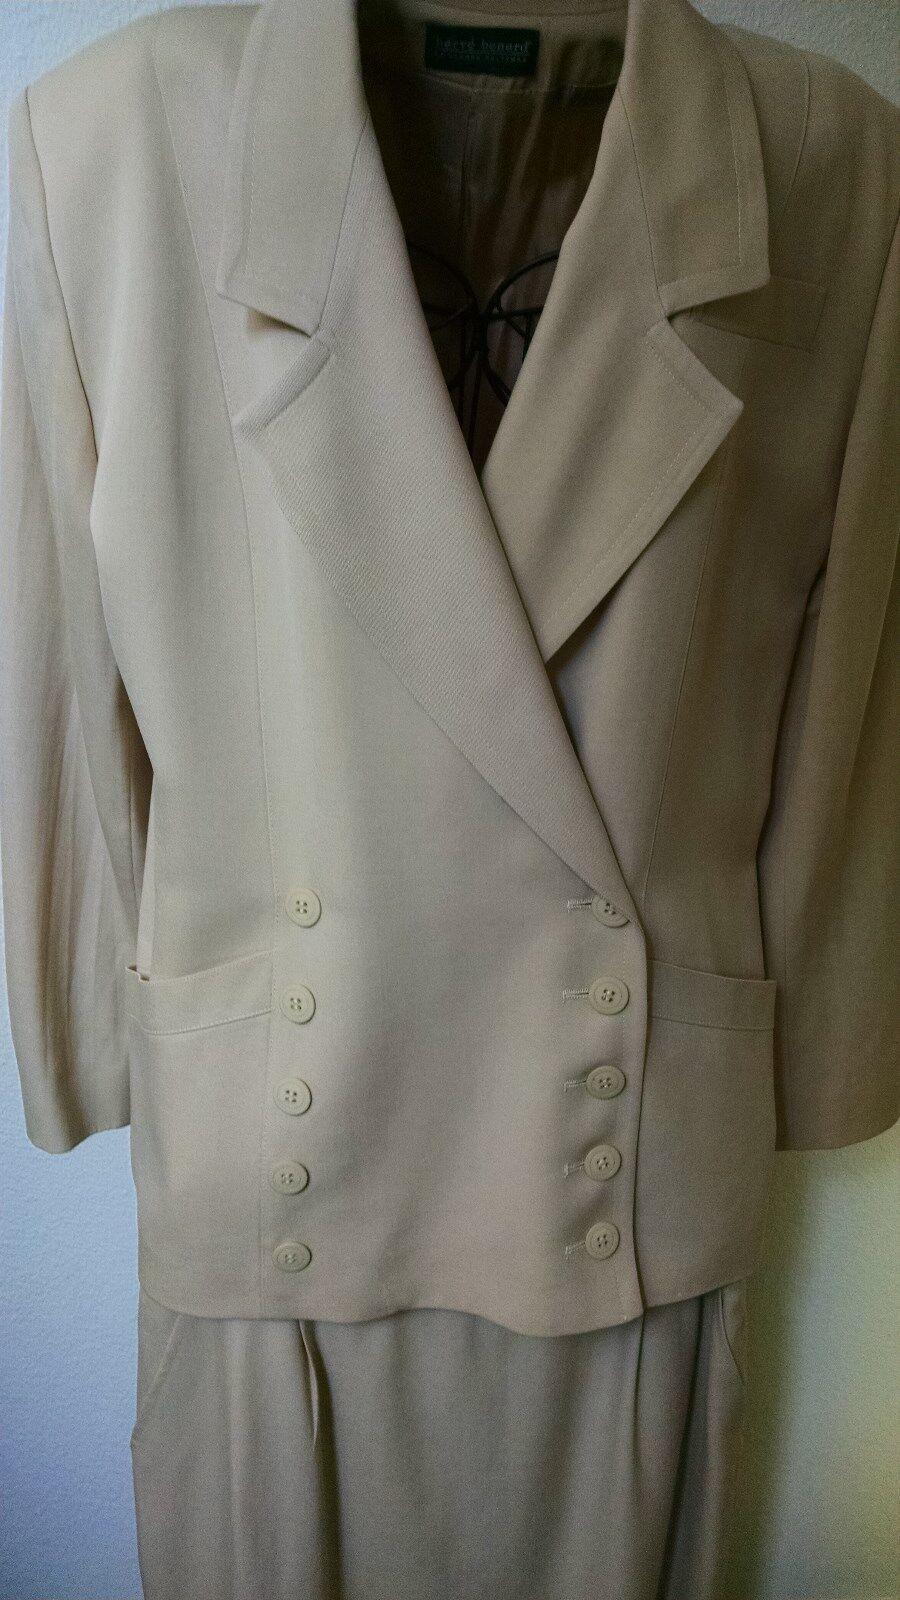 Harve Bernard, Beige Wool Double Breasted Suit, Size 12, Item